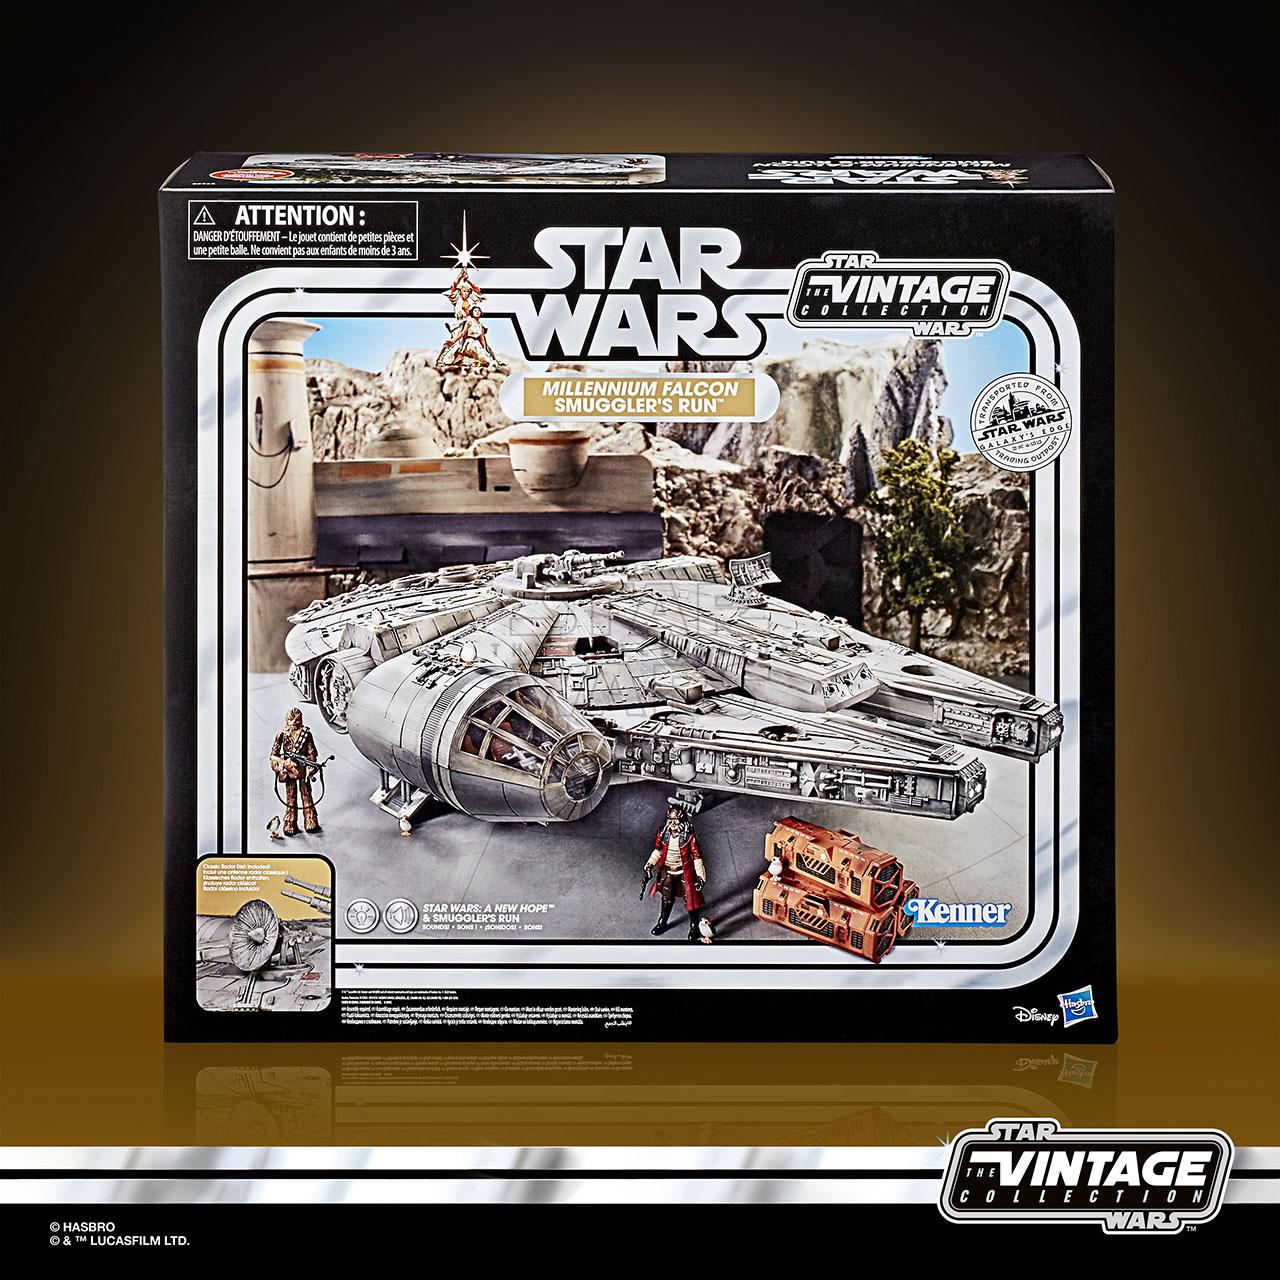 star-wars-the-vintage-collection-galaxy_u2019s-edge-millennium-falcon-smuggler_u2019s-run-vehicle-pckging-1.jpg